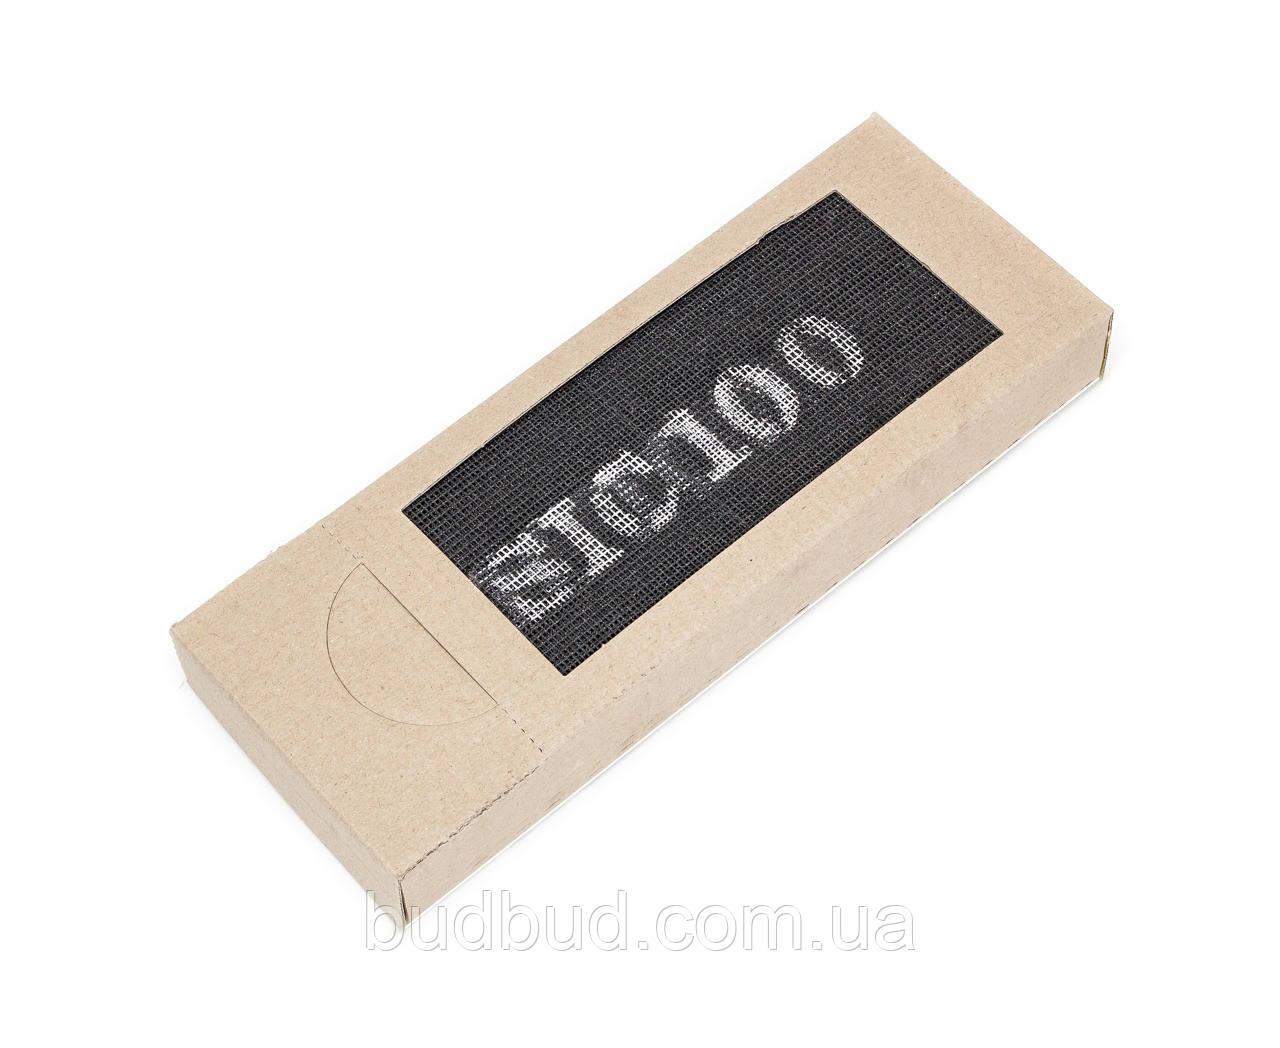 Сетка абразивная SIC P1500 (1000-173) POLAX (50шт/уп) 1 шт